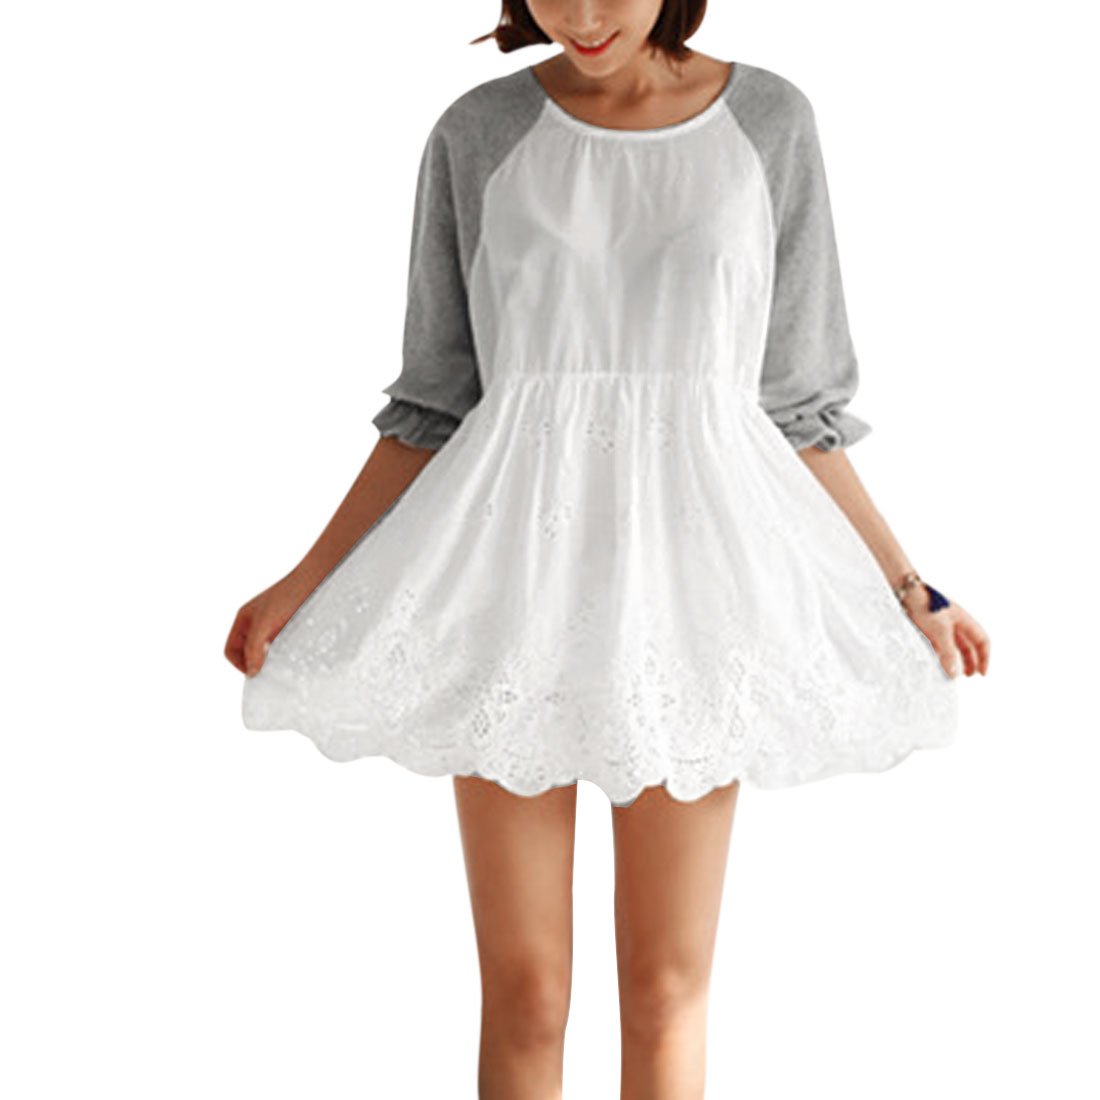 Ladies Raglan Sleeve Elastic Waist Crochet Flower Design White Mini Dress XS